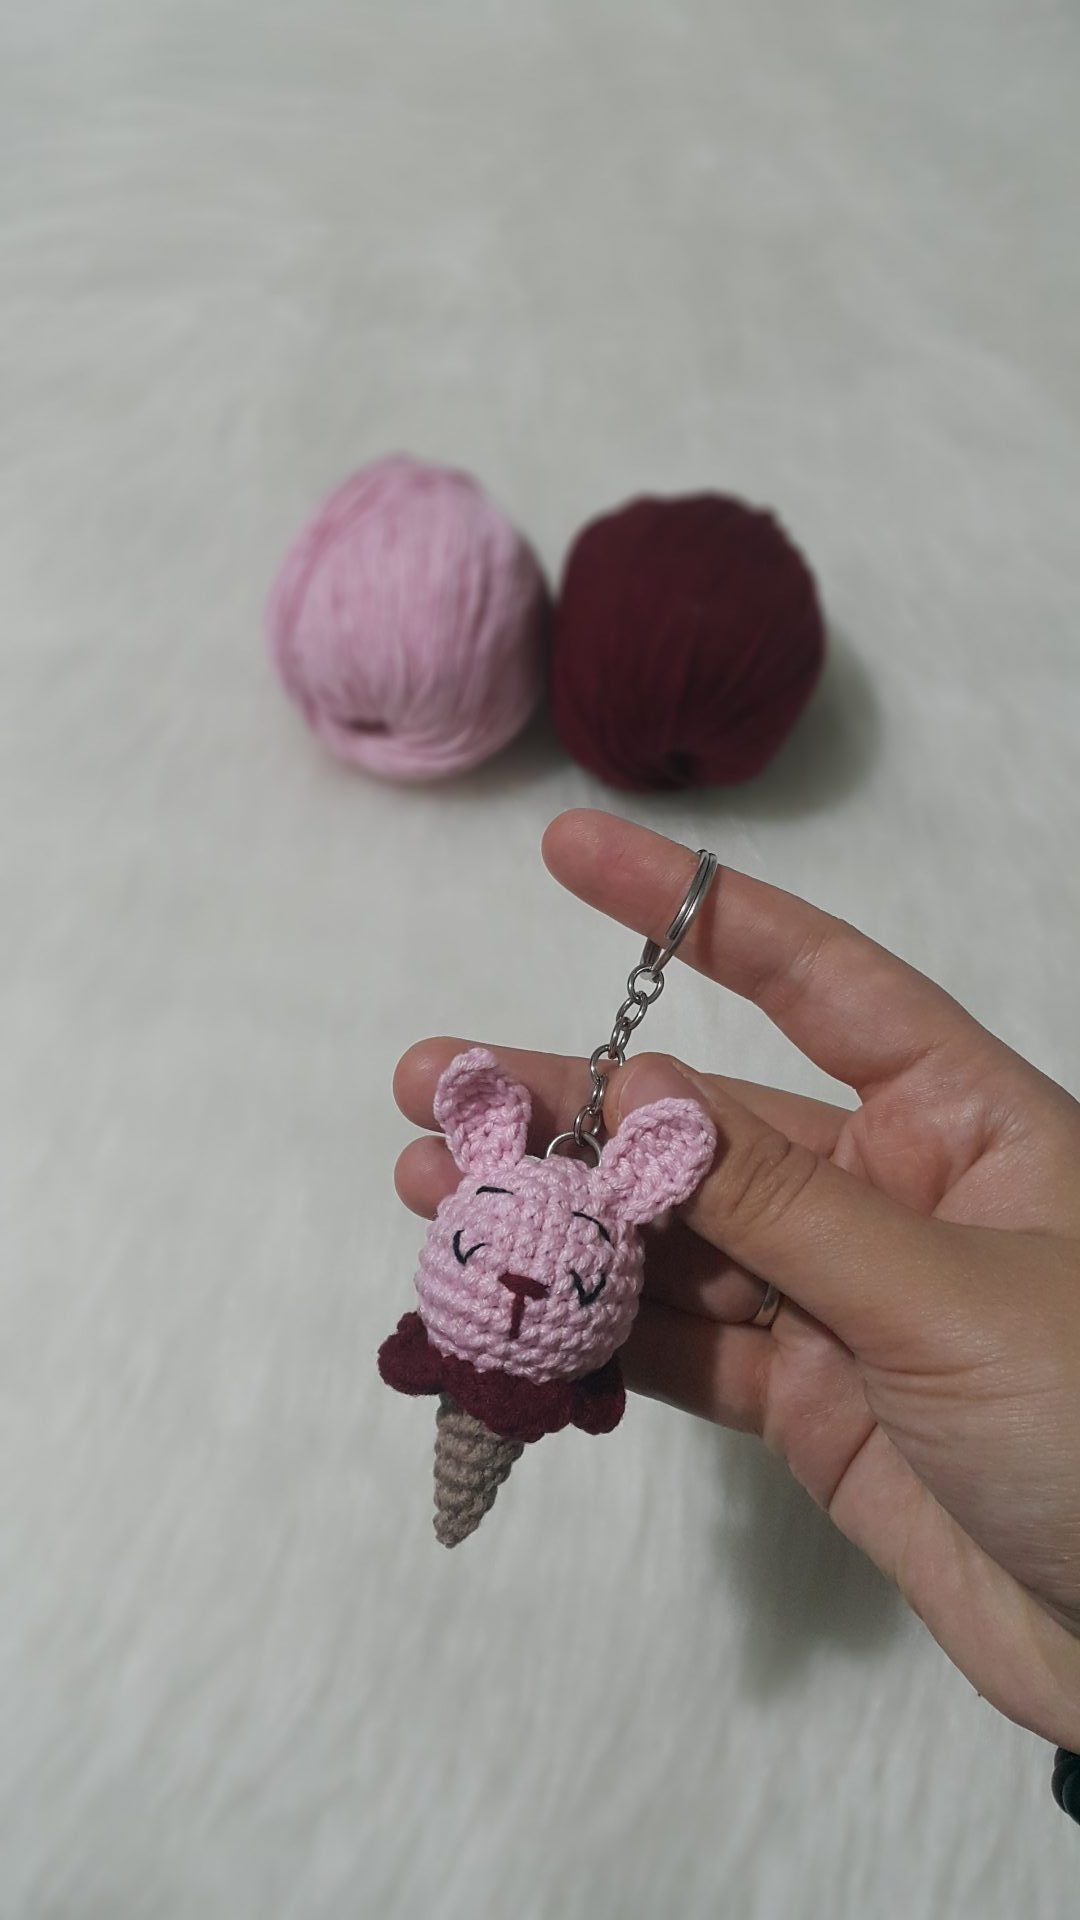 AMİGURUMİ DONDURMA ANAHTARLIK, ÇANTA SÜSÜ YAPIMI. Crochet making ... | 1920x1080